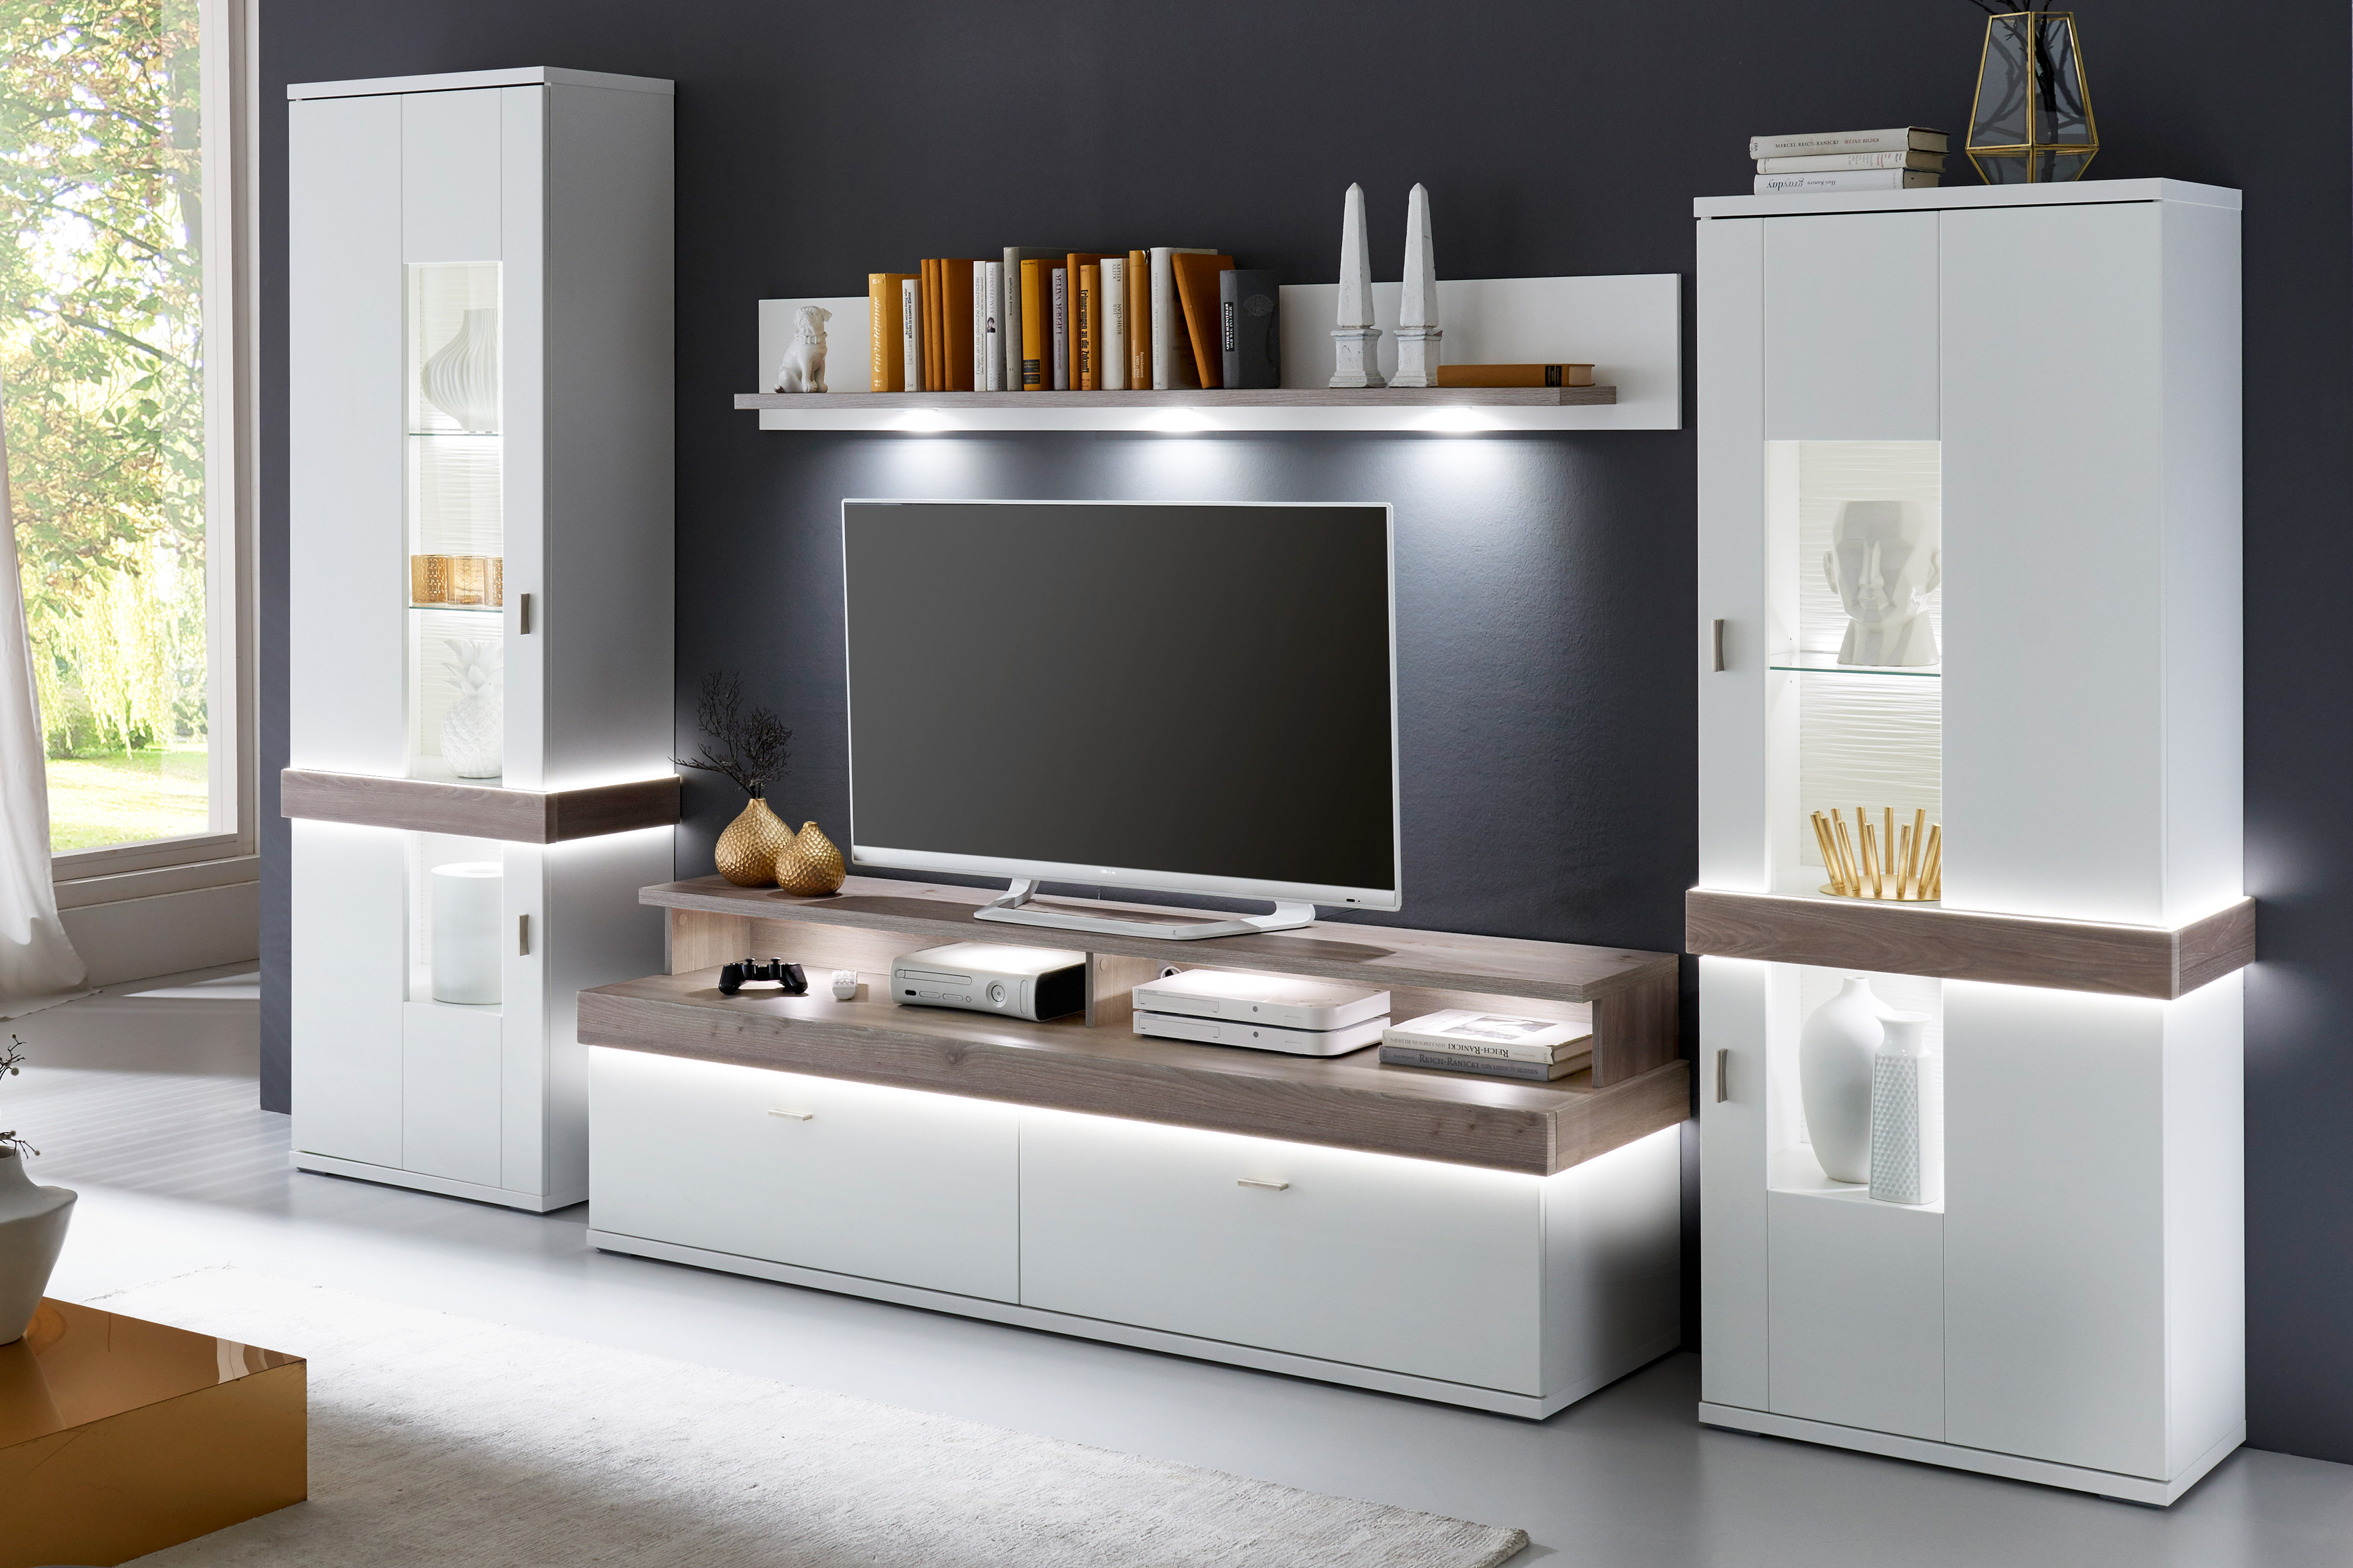 ideal m bel wohnwand albi wei nelson nordic m bel letz. Black Bedroom Furniture Sets. Home Design Ideas